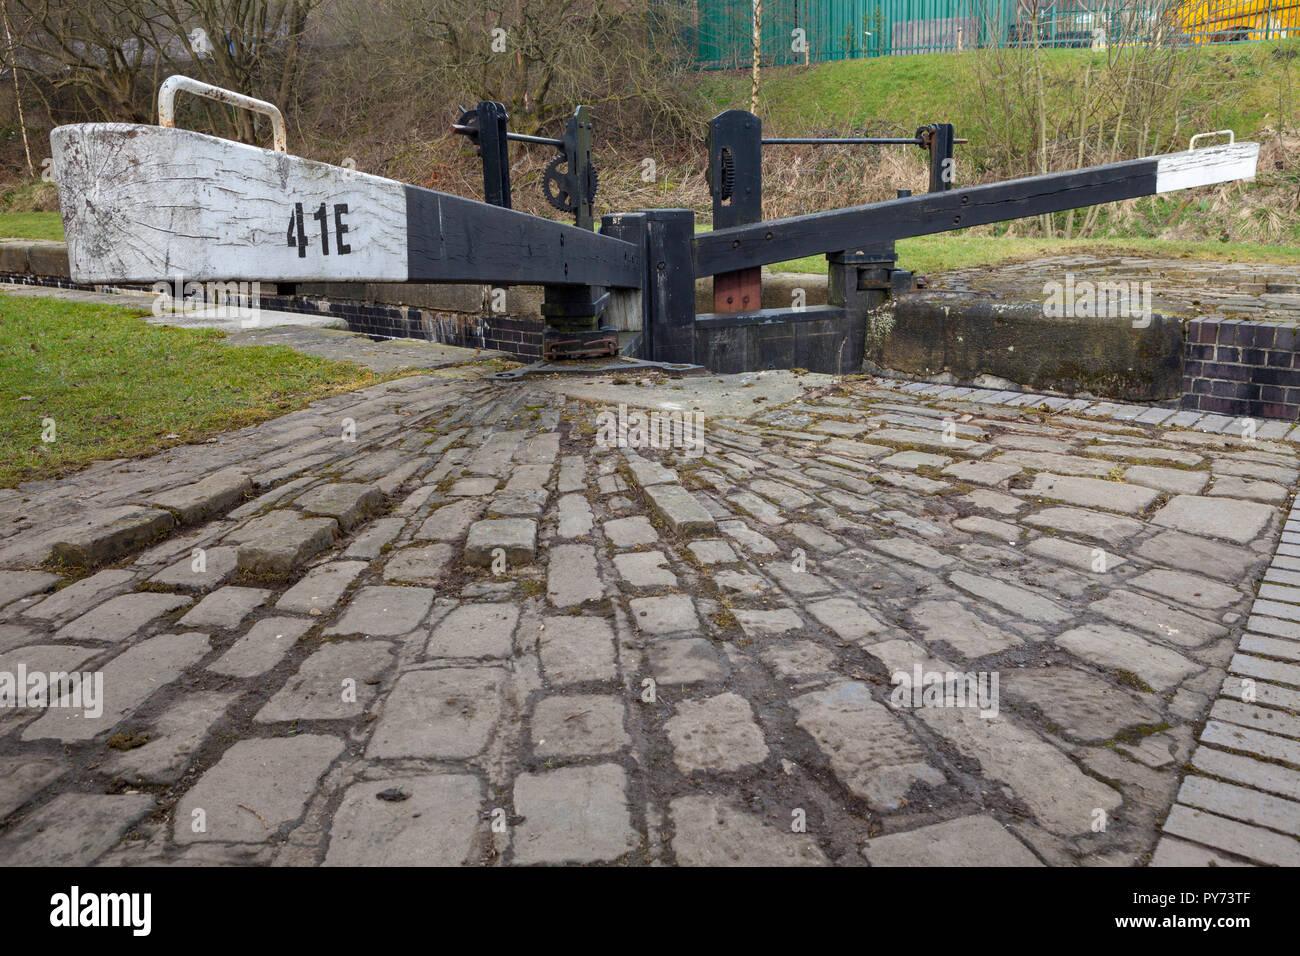 Lock gates on the Huddersfield Narrow Canal near Marsden in West Yorkshire - Stock Image